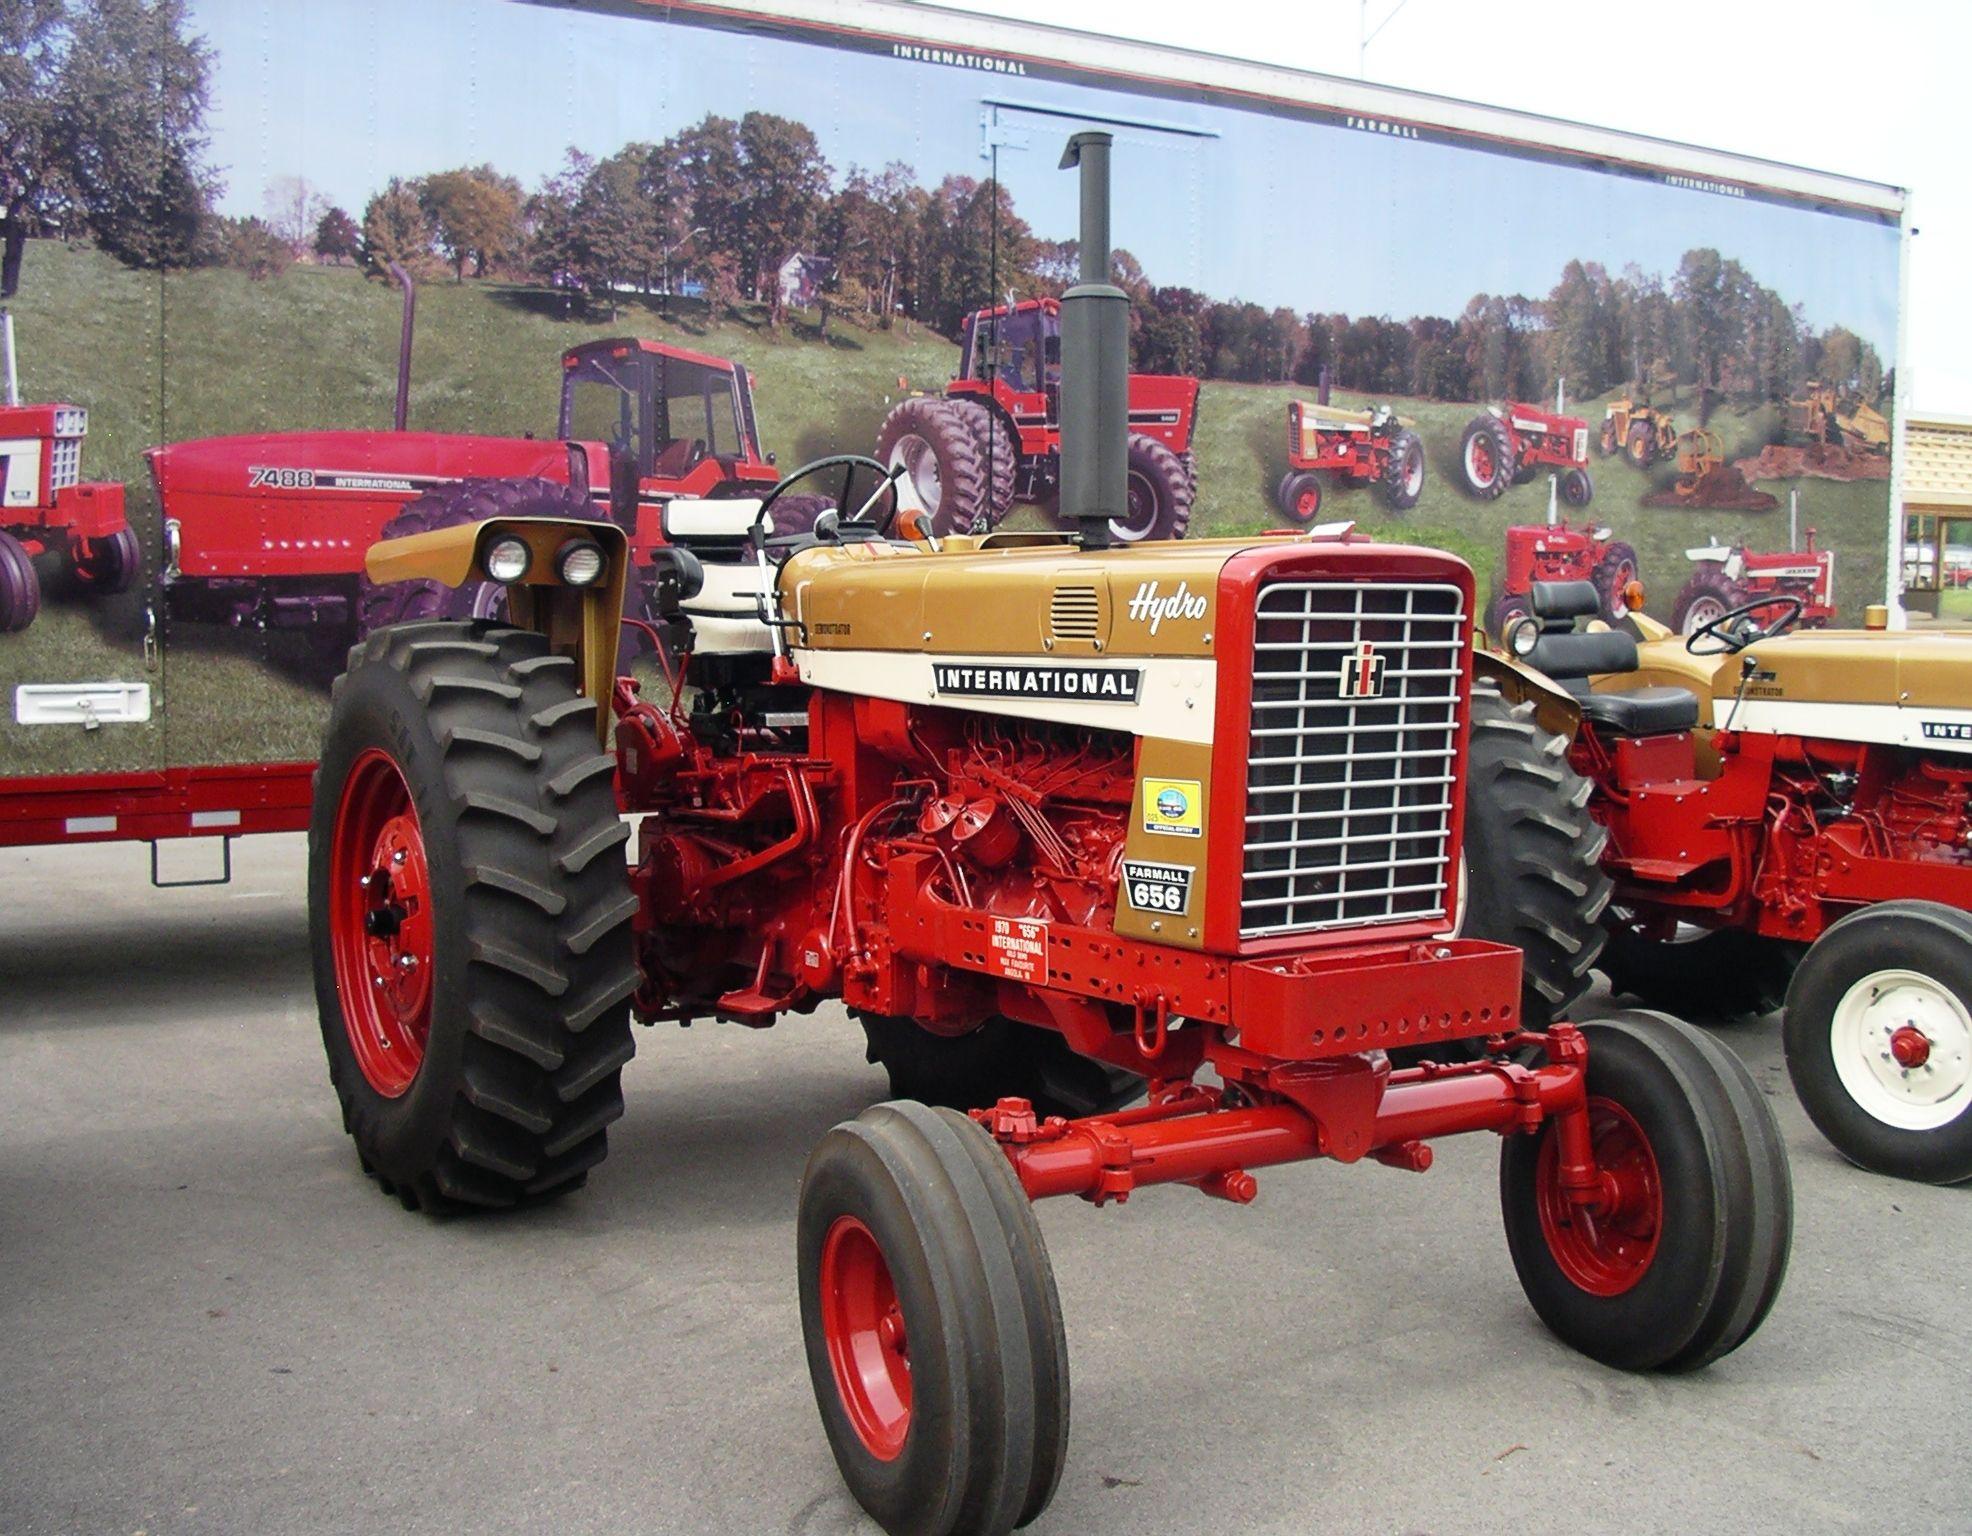 986 international tractor wiring diagram pioneer for car stereo ih hvac diagrams